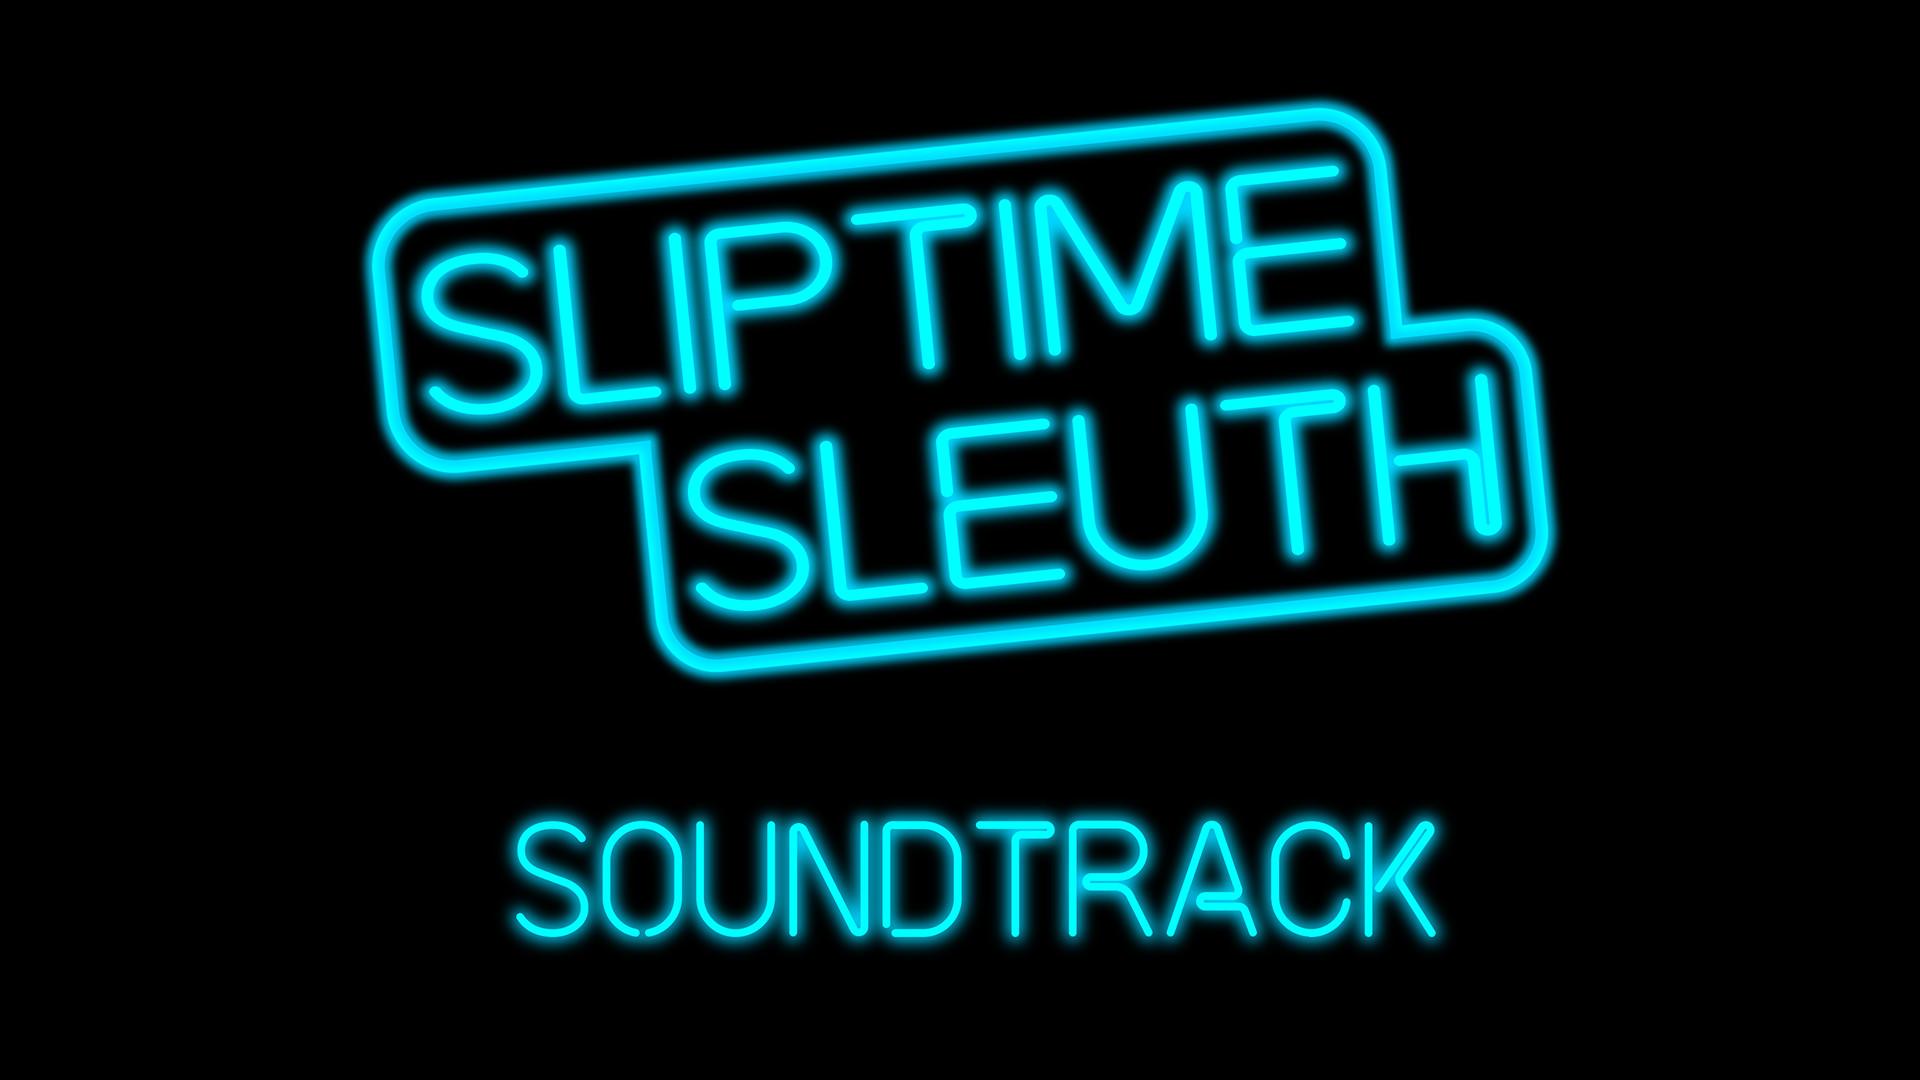 Sliptime Sleuth OST screenshot